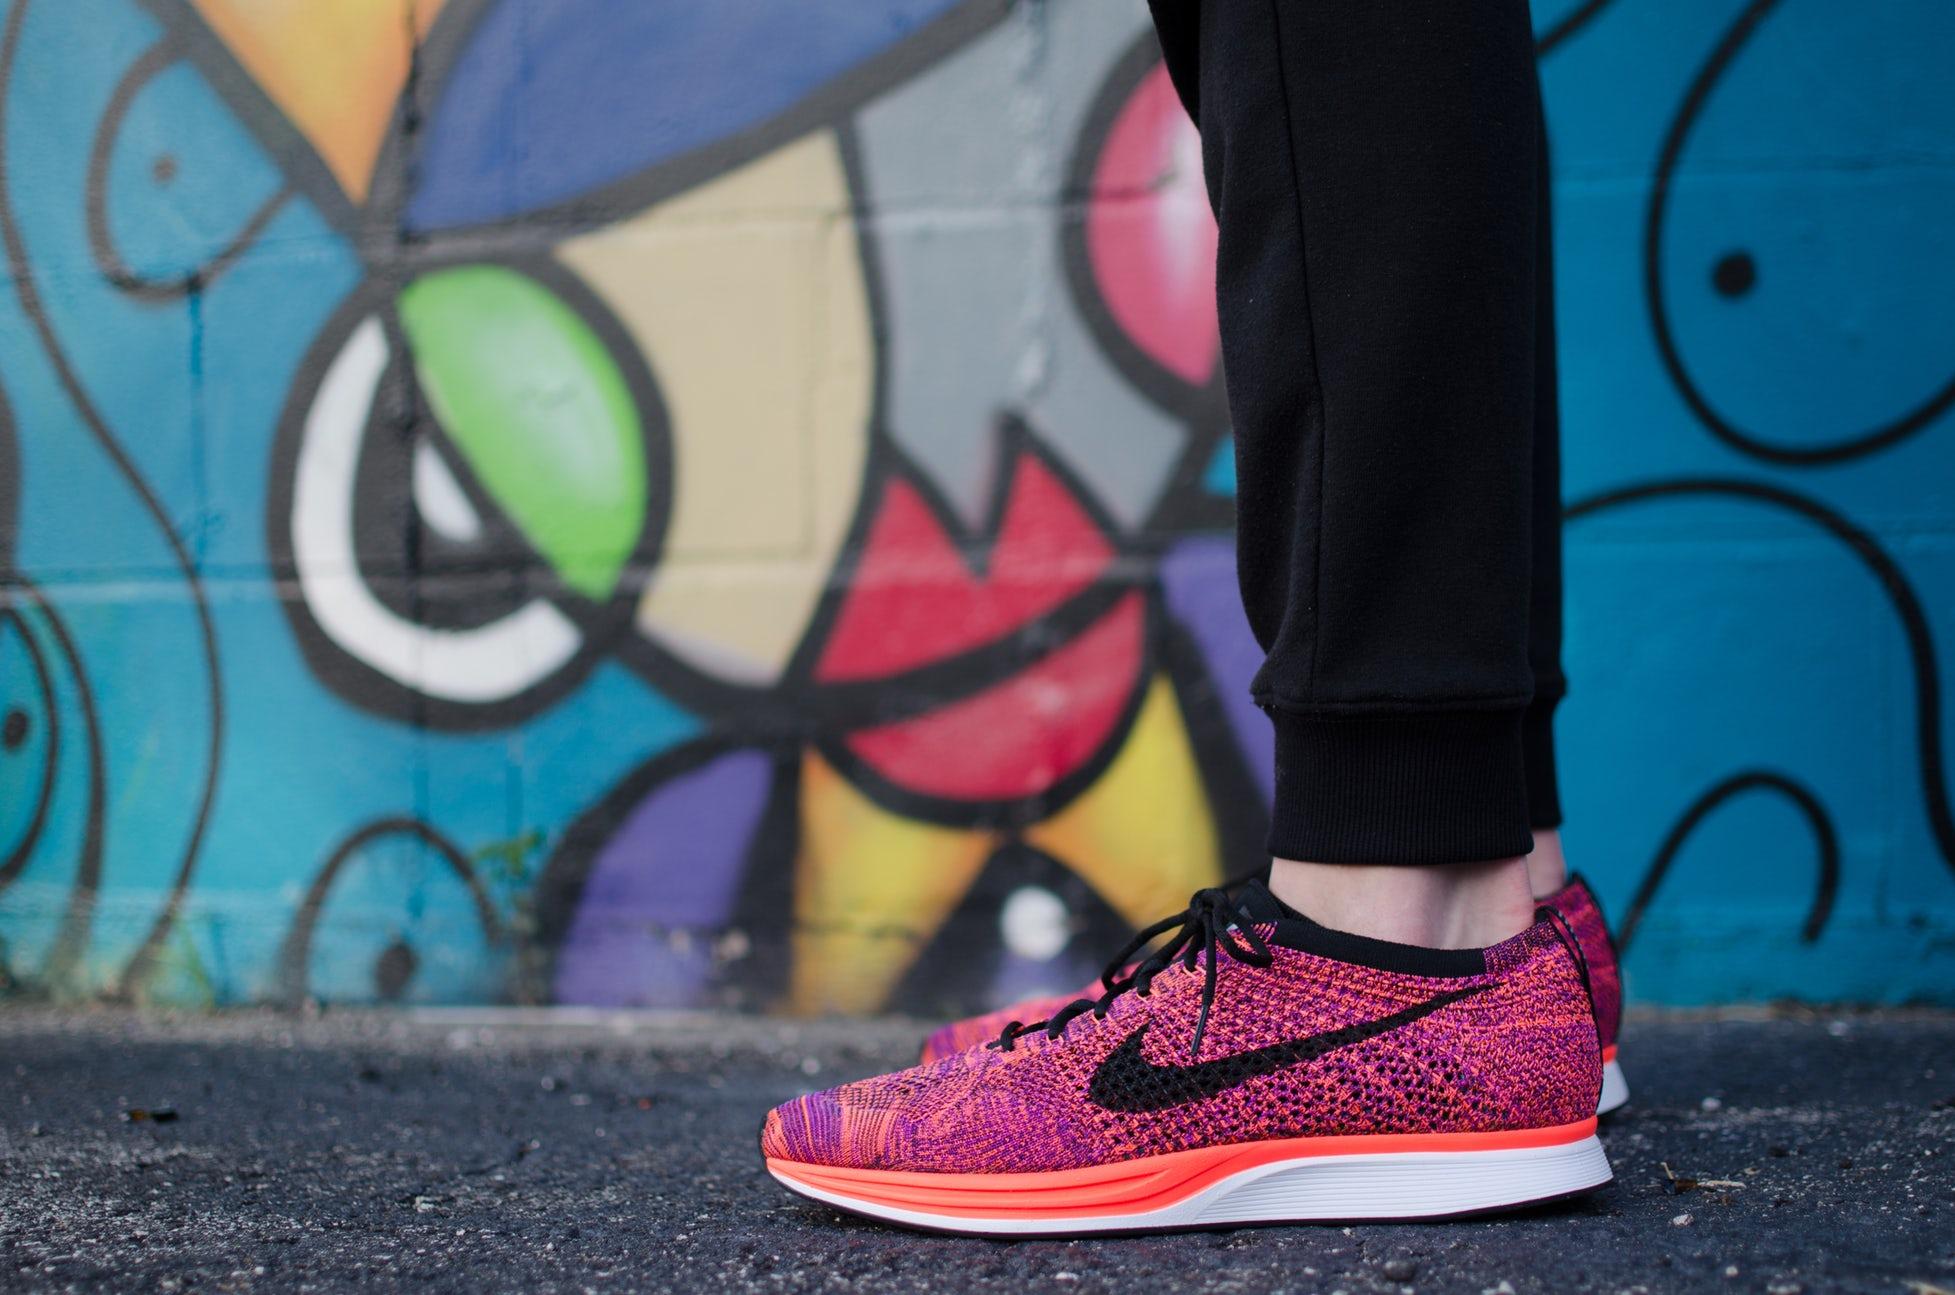 Продажа кроссовок бизнес план бизнес планы обуви